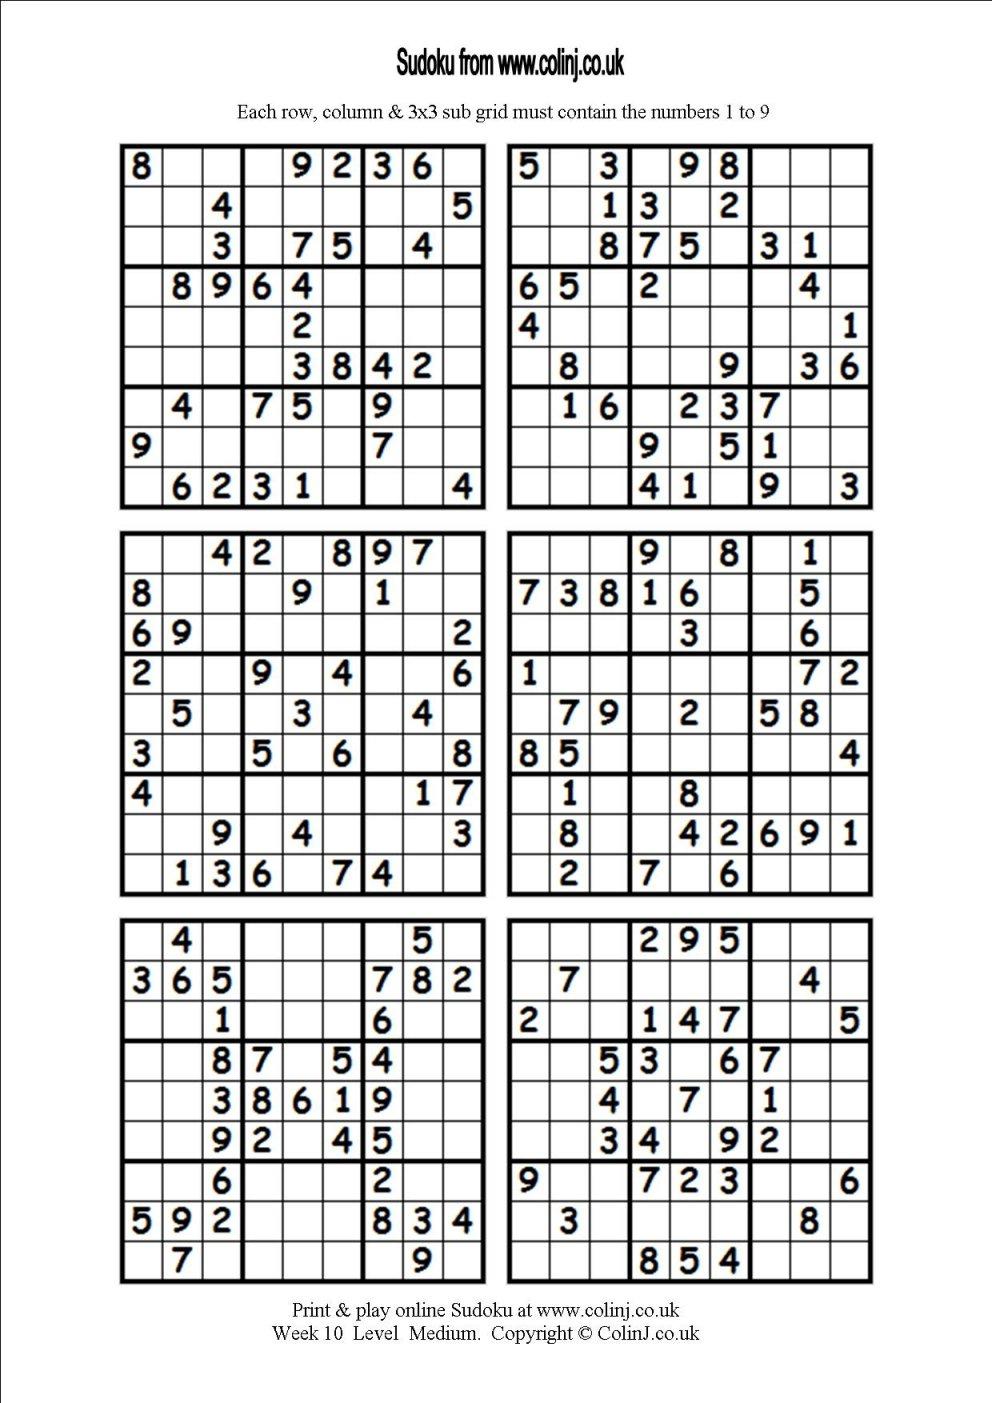 Printable Sudoku Puzzles 6 Per Page | Download Them Or Print - Free - Printable Sudoku Puzzles 8 Per Page